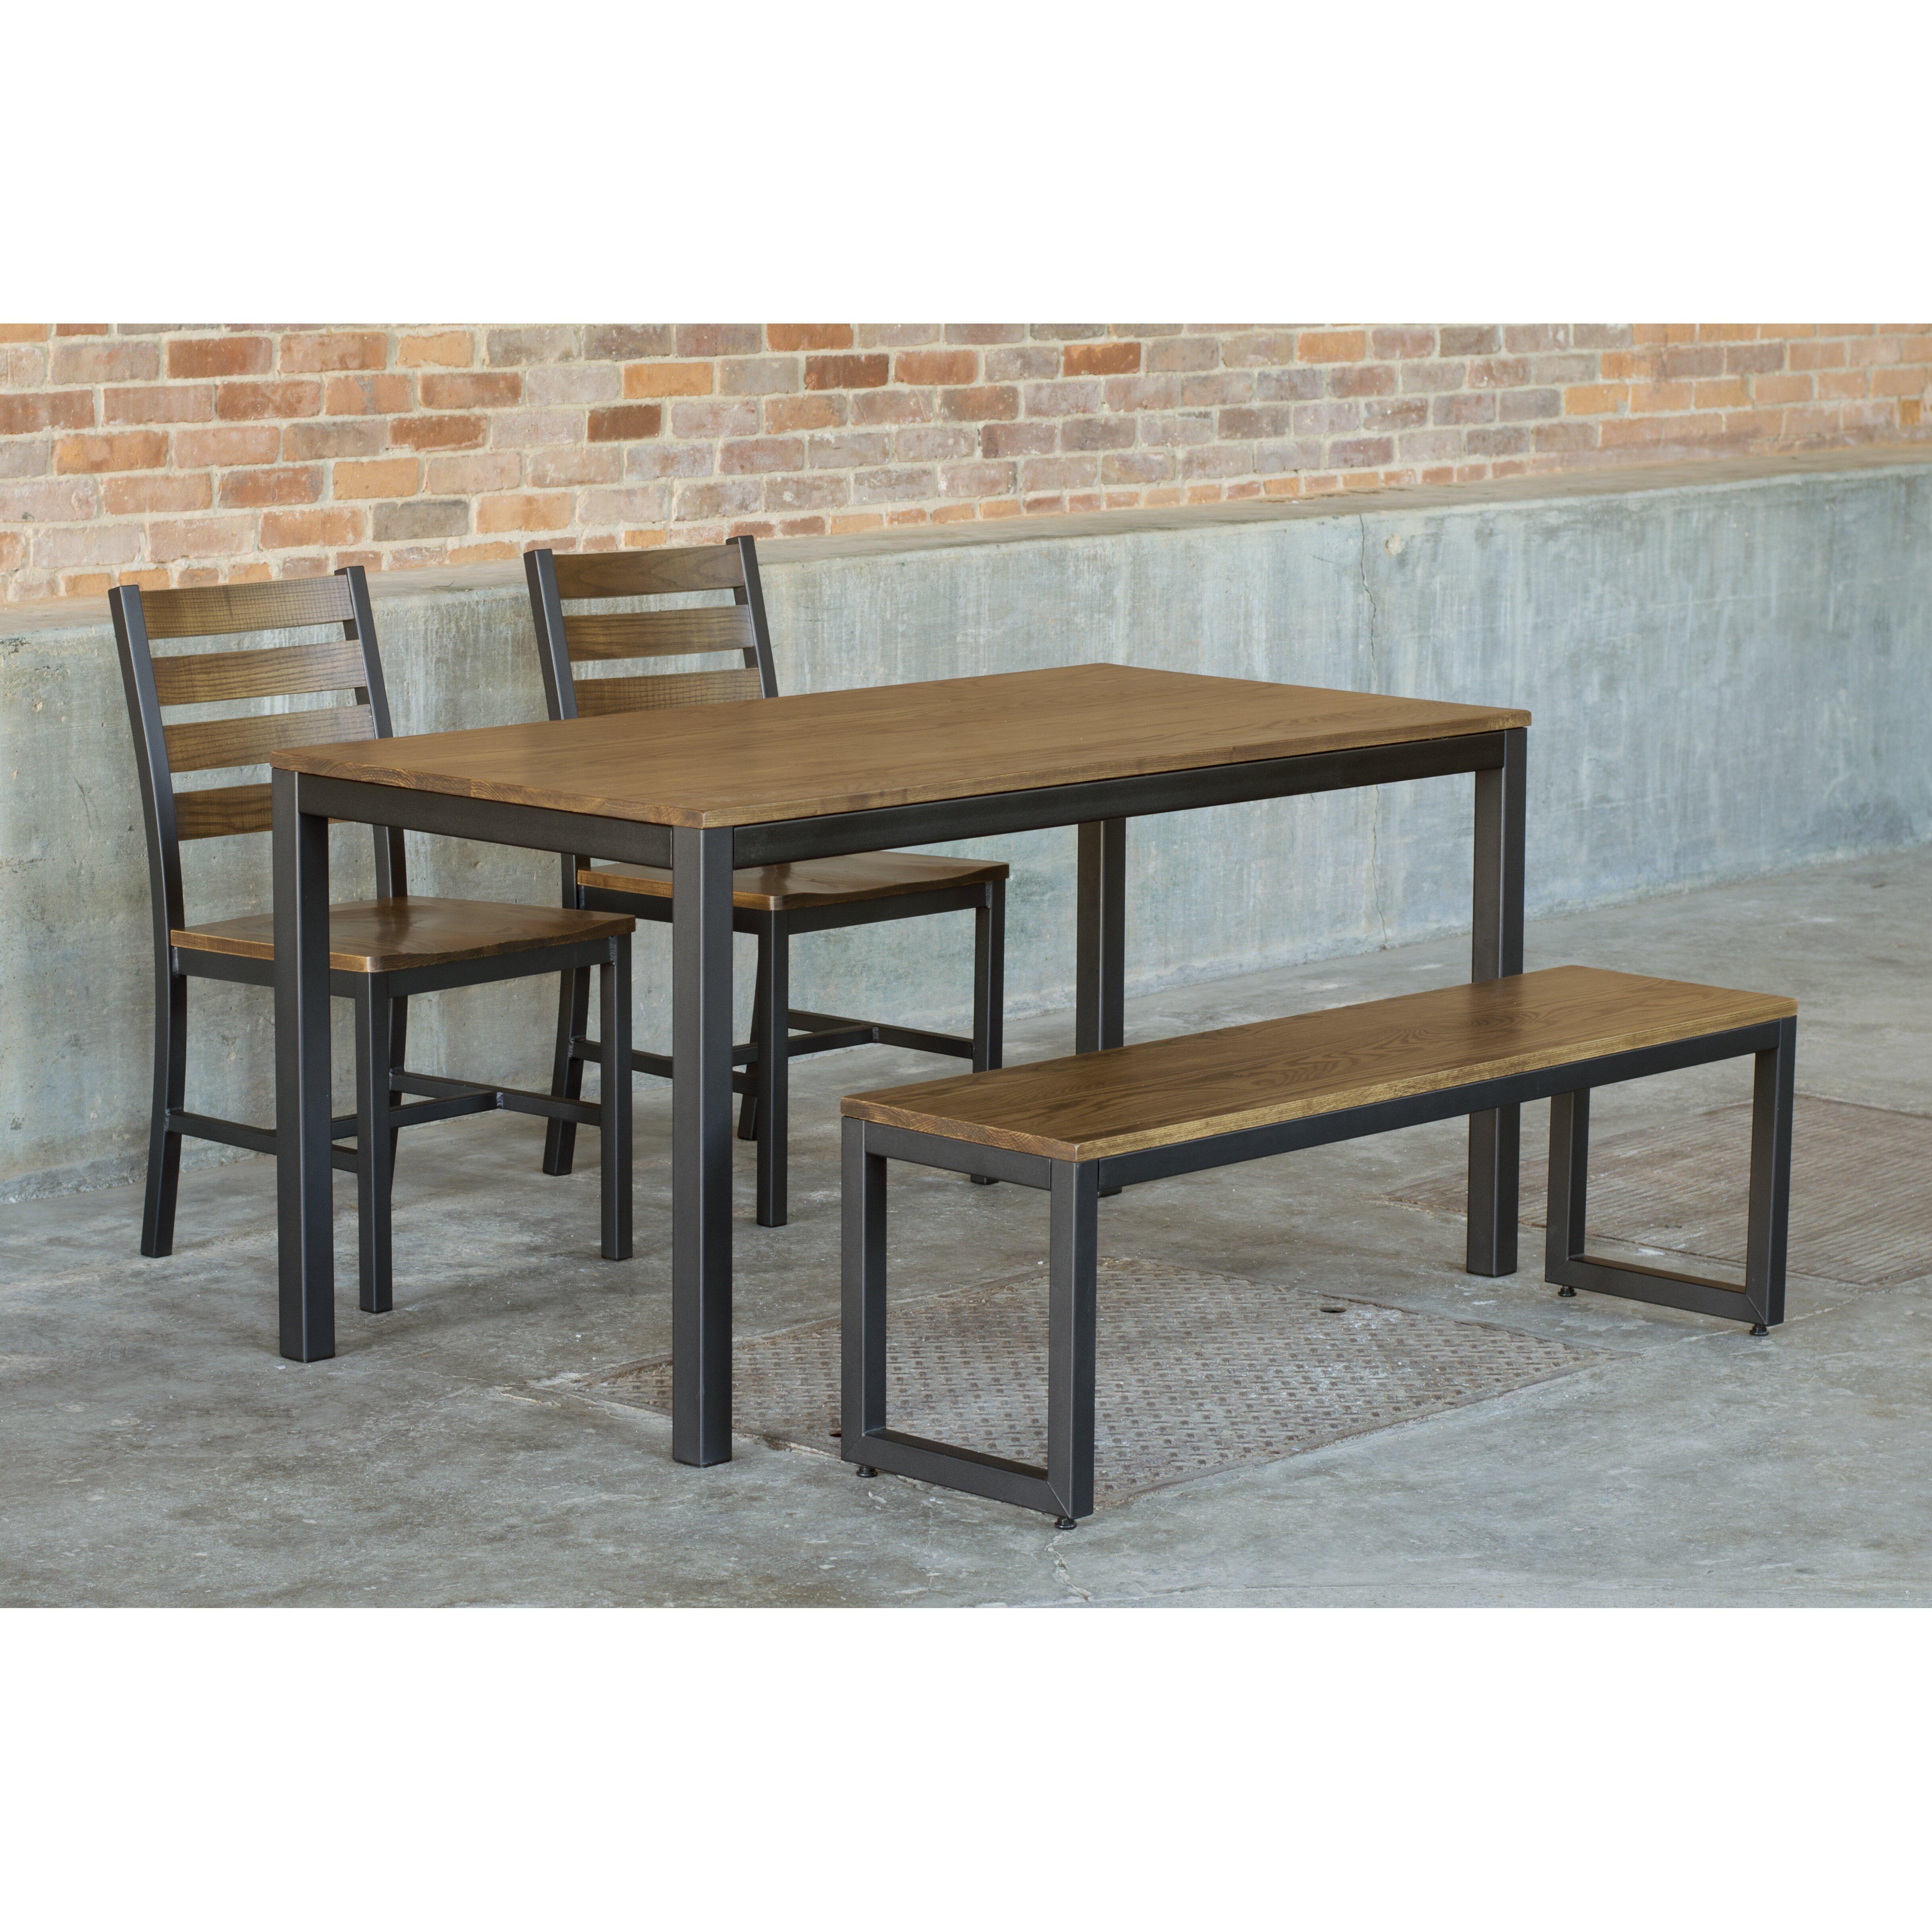 Elan furniture loft 4 piece dining set wayfair for 4 piece dining room set